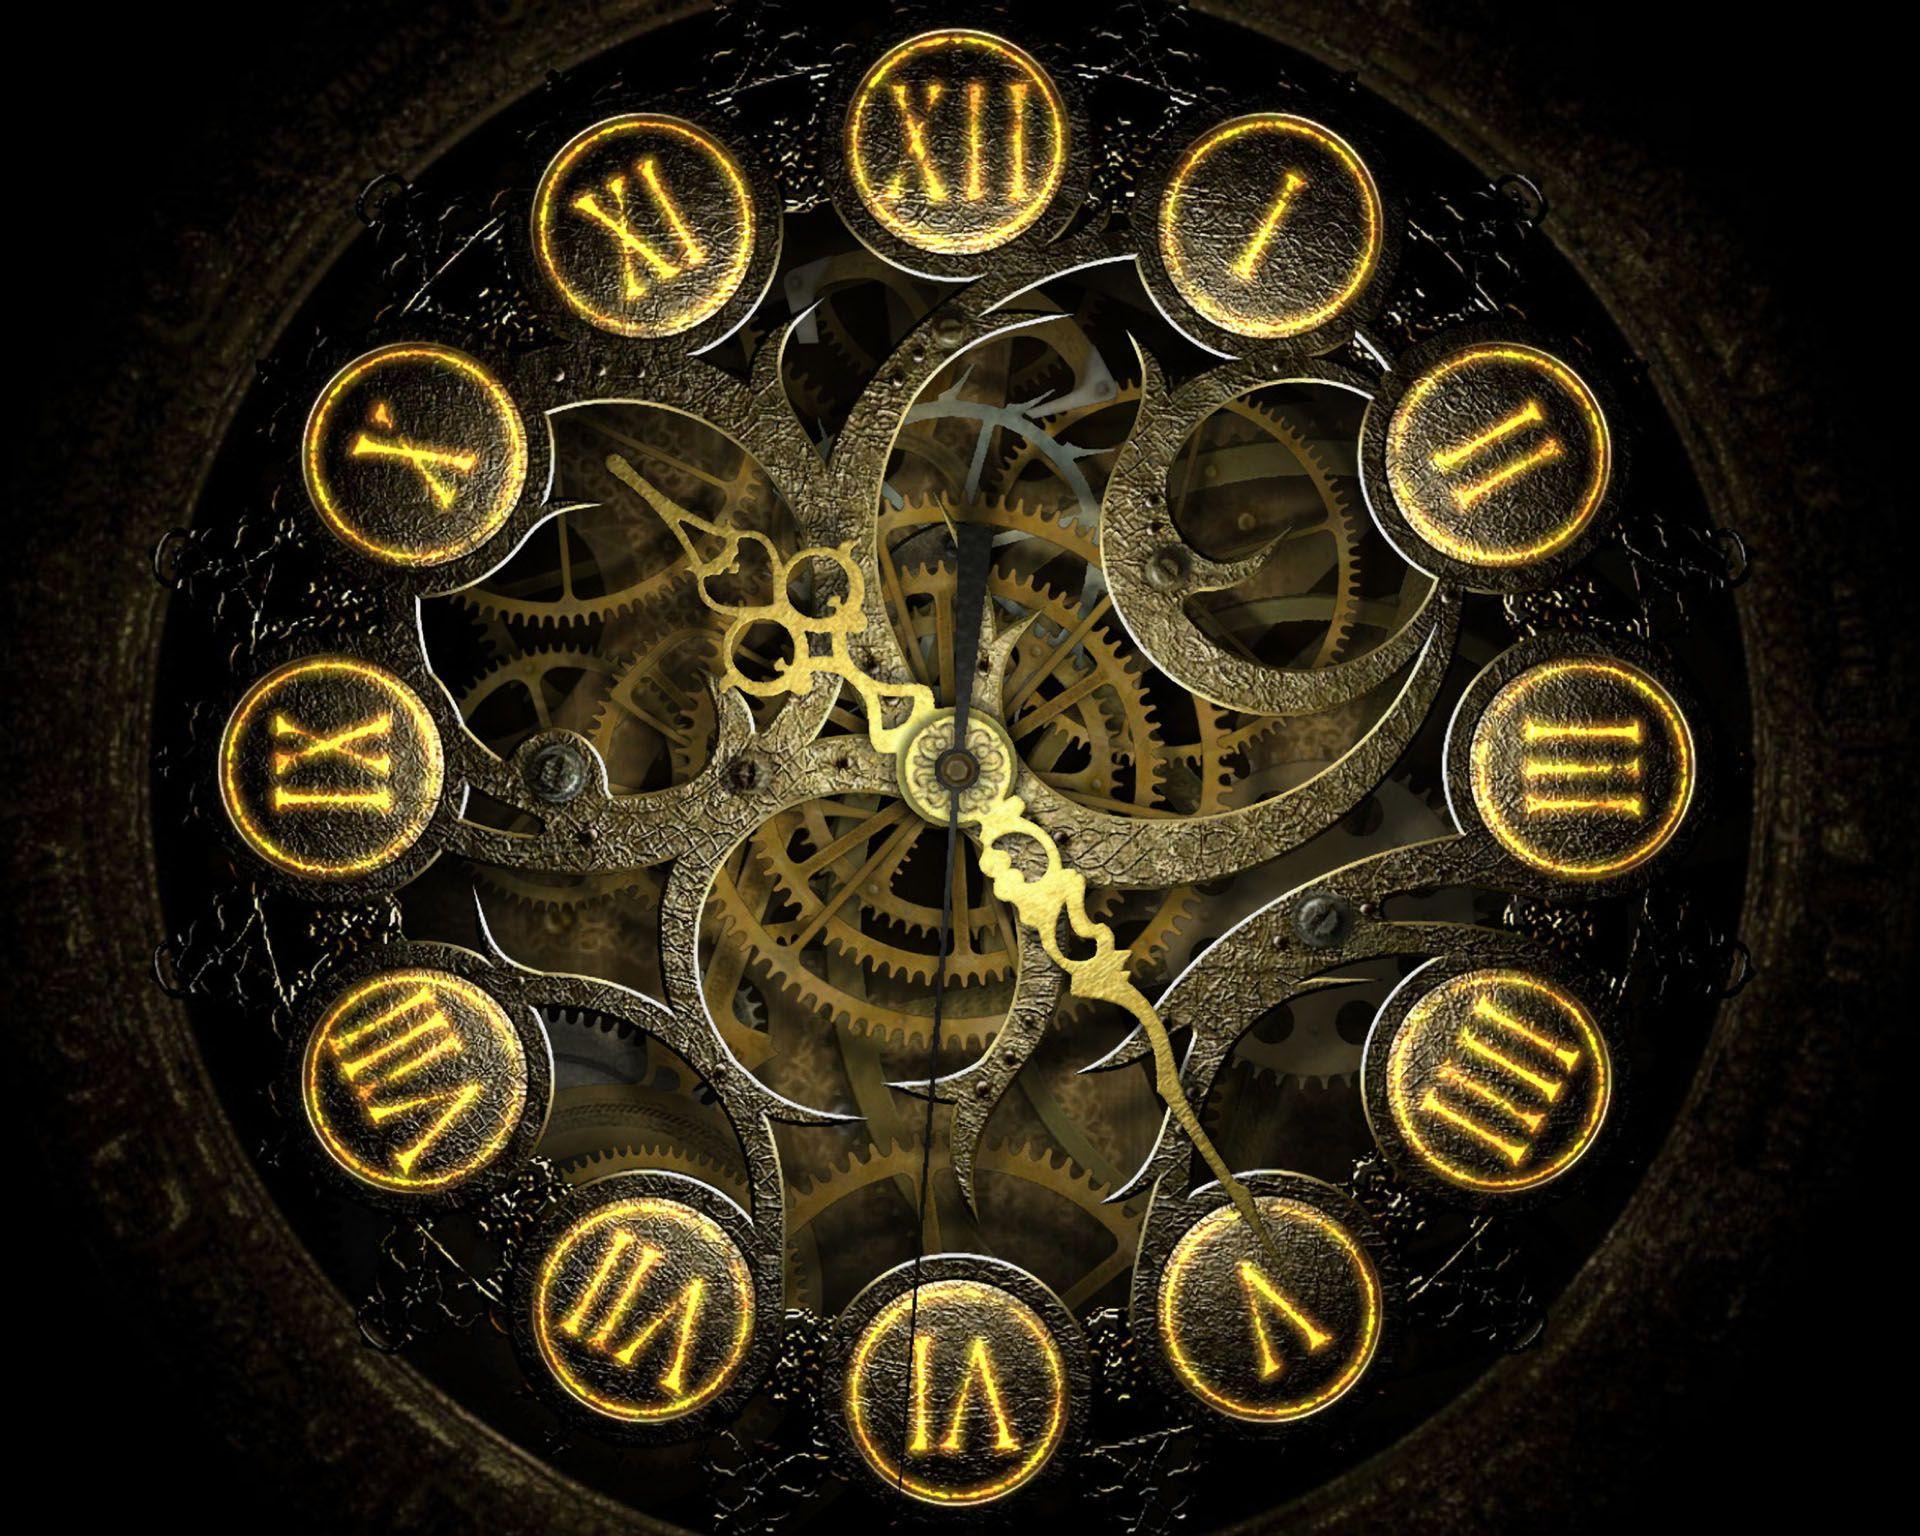 bvlgari watch time clock wallpaper 1920a—1536 watch wallpaper 28 wallpapers adorable